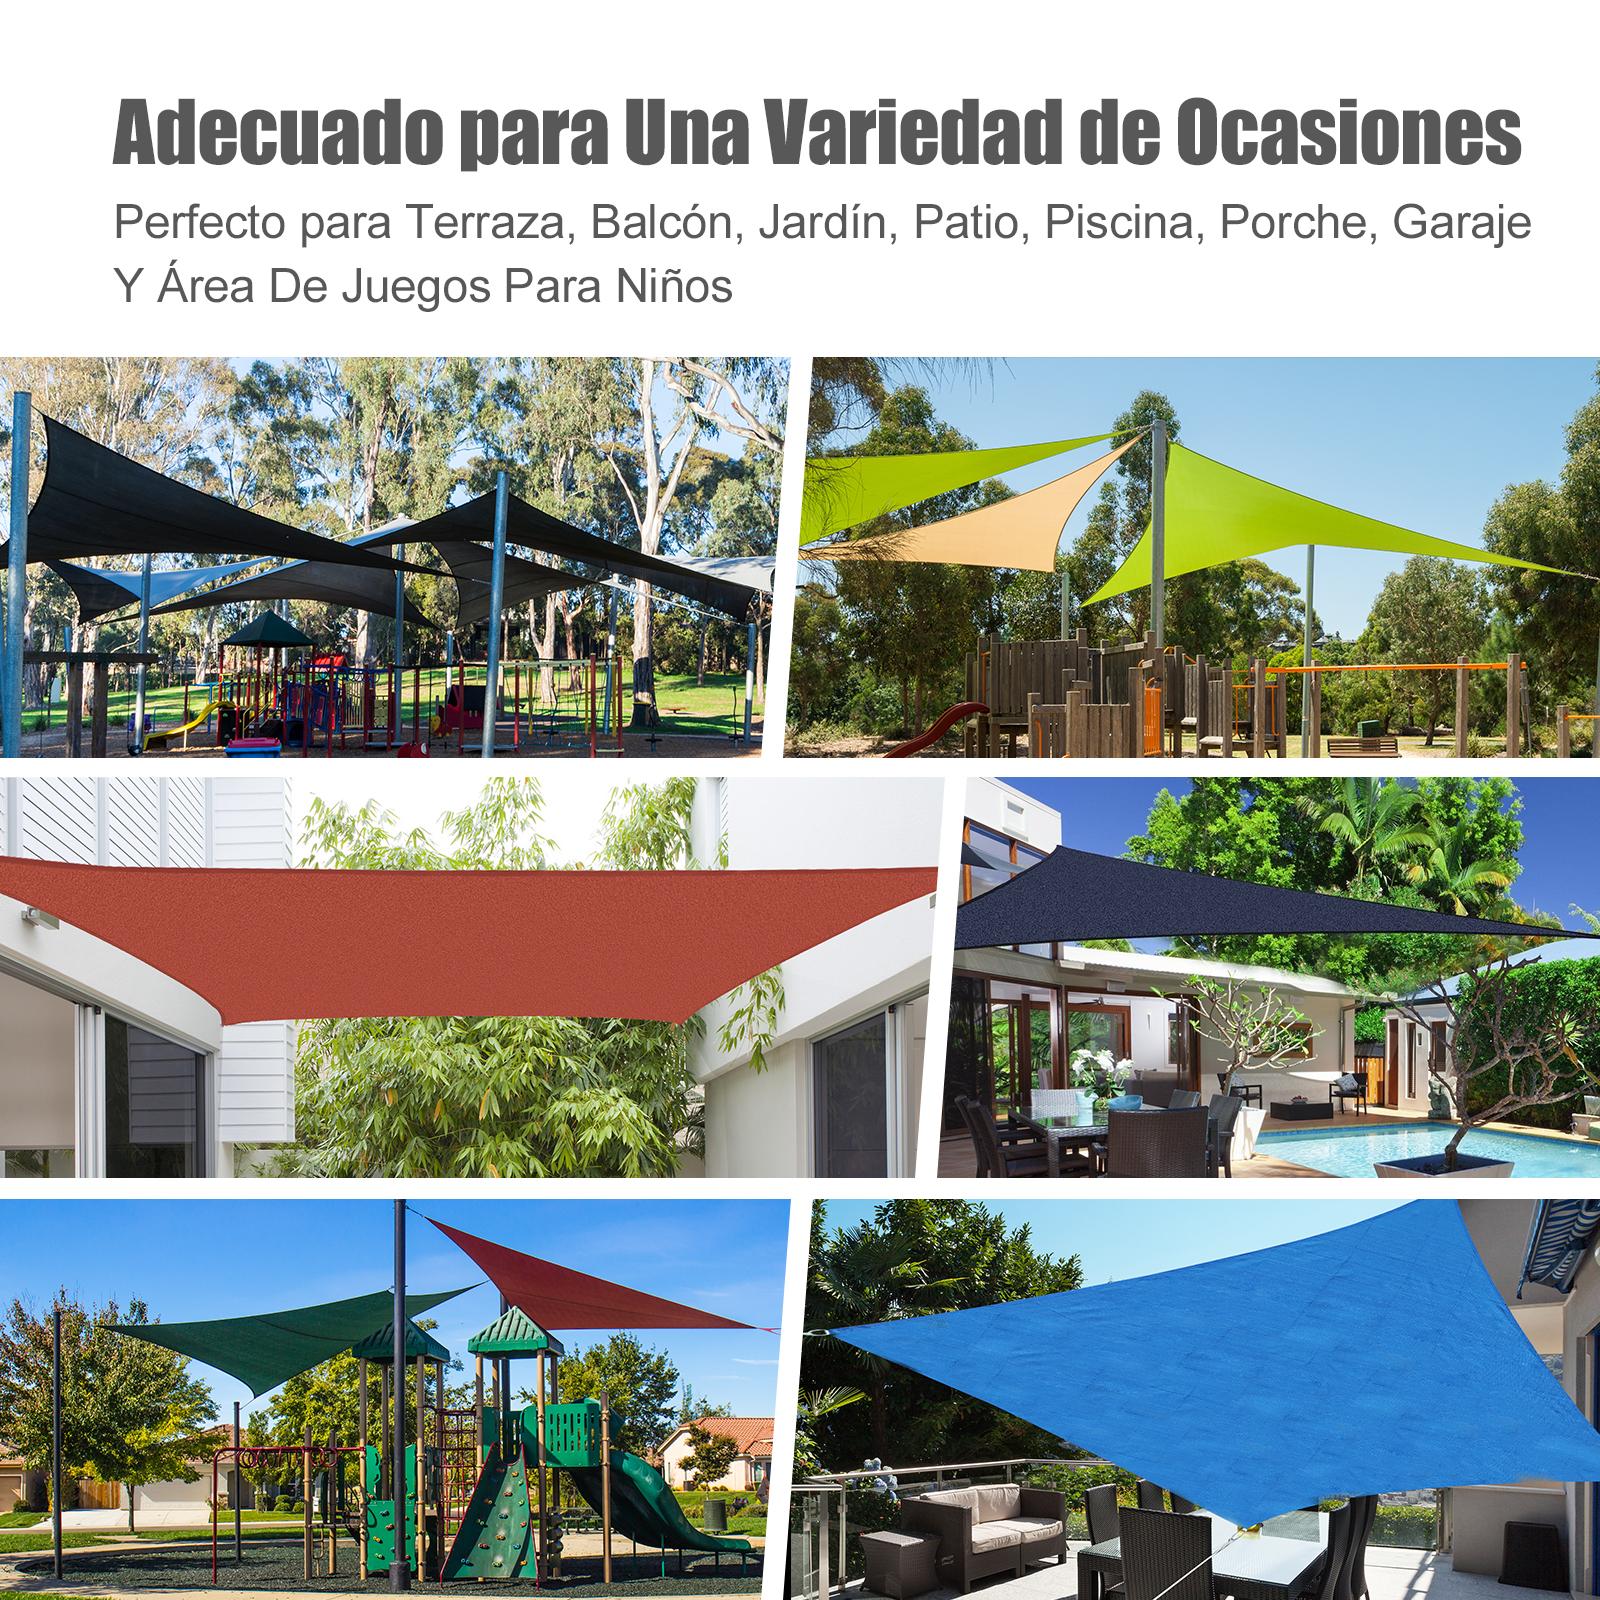 Toldo-Vela-Sombrilla-Parasol-Triangulo-Tejido-de-Poliester-185-g-m-Jardin-Playa miniatura 7